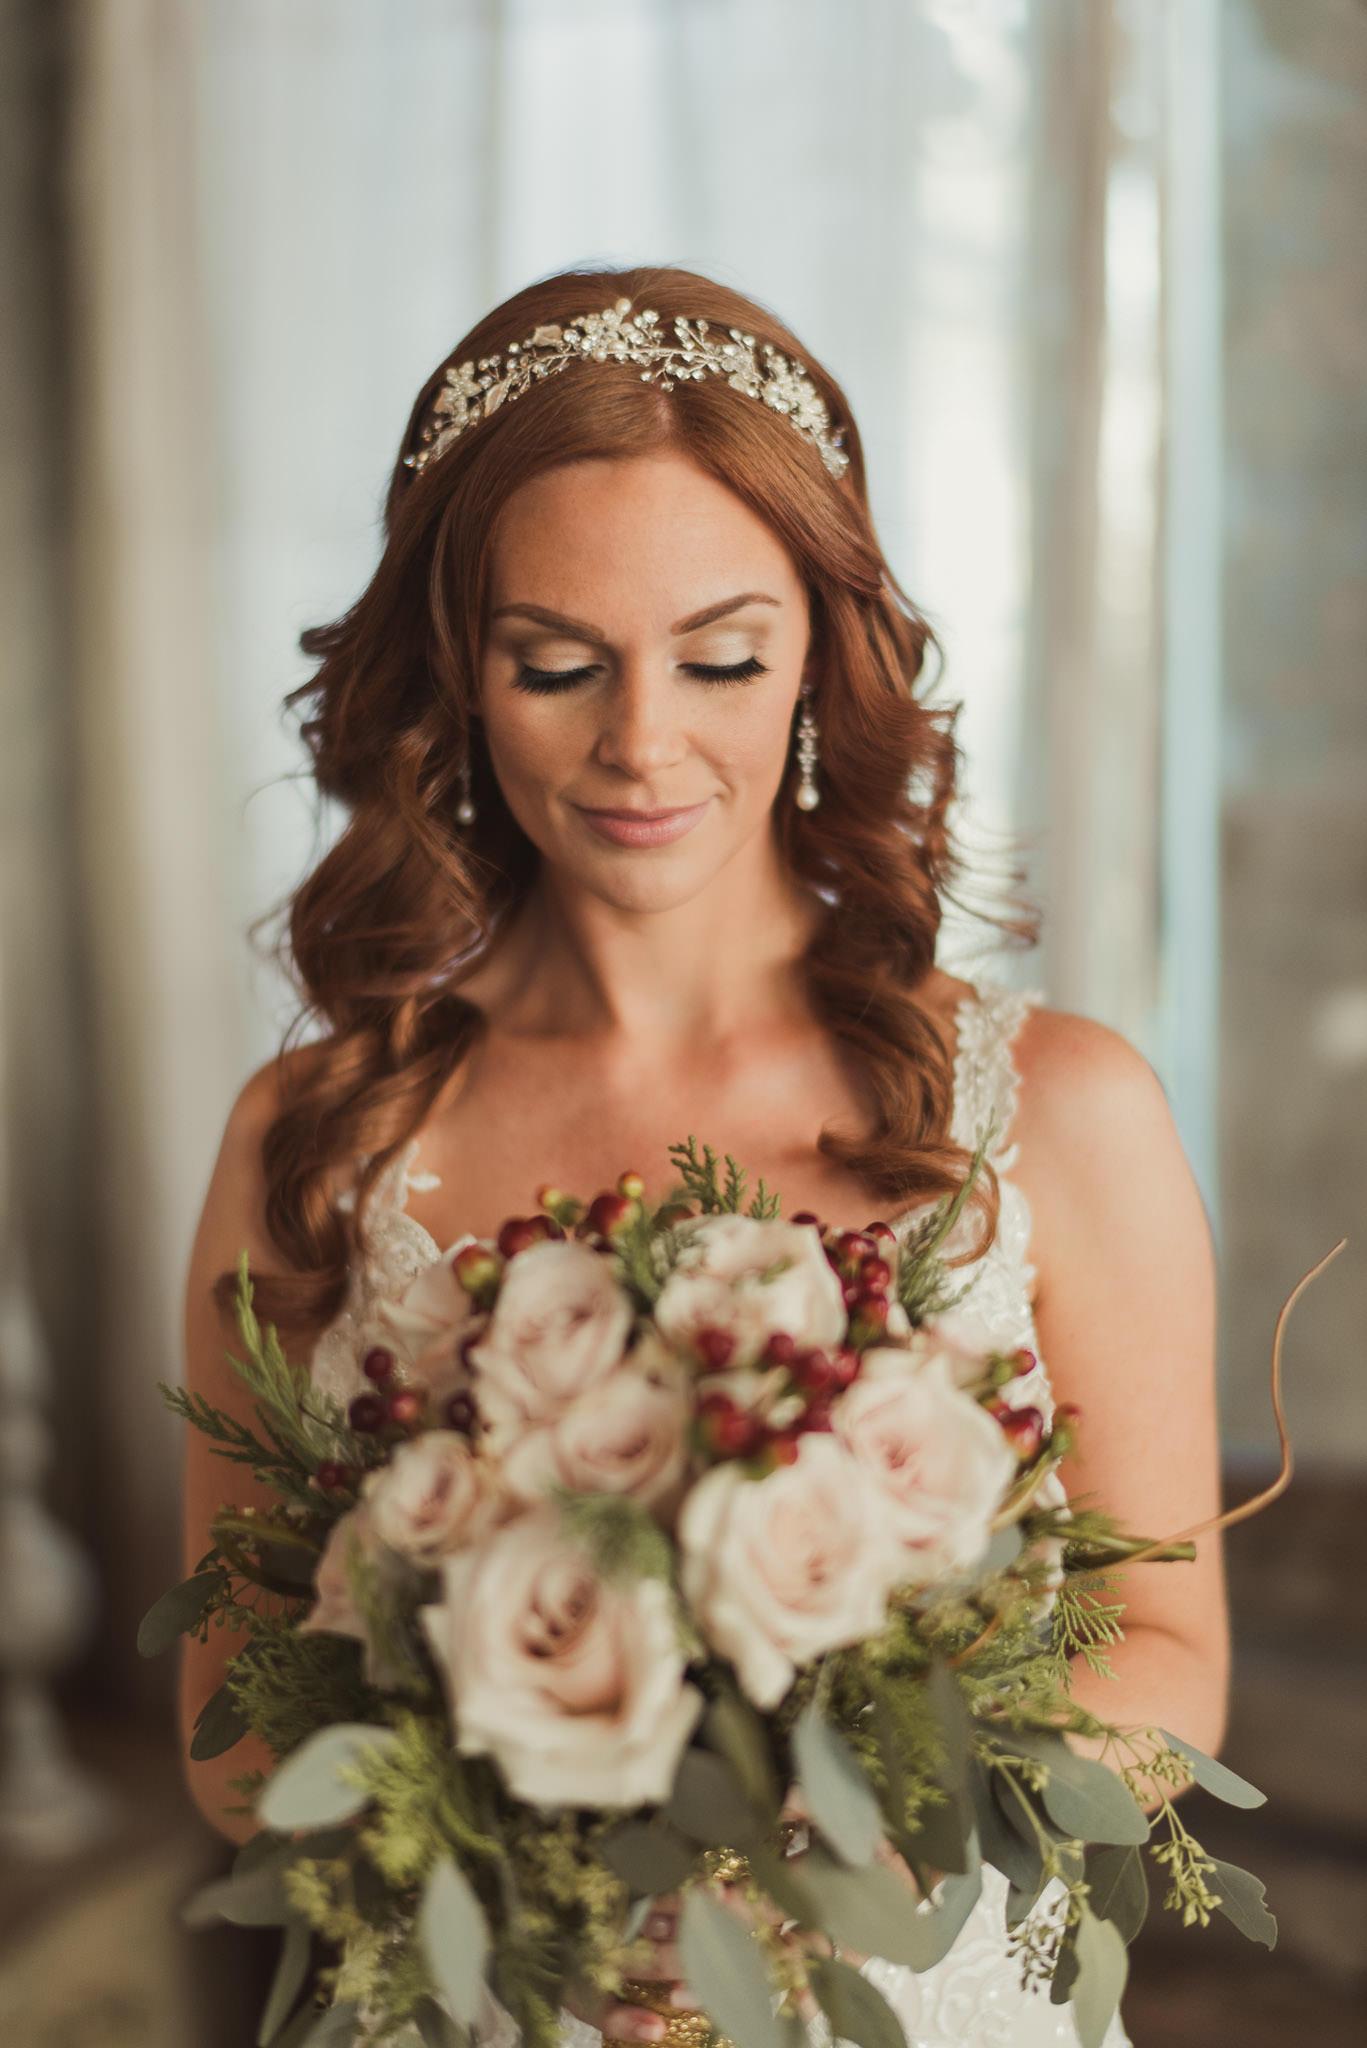 Cynthia-Curtis-Olde-Dobbine-Station-Houston-Wedding-Photographer-sm-41.jpg